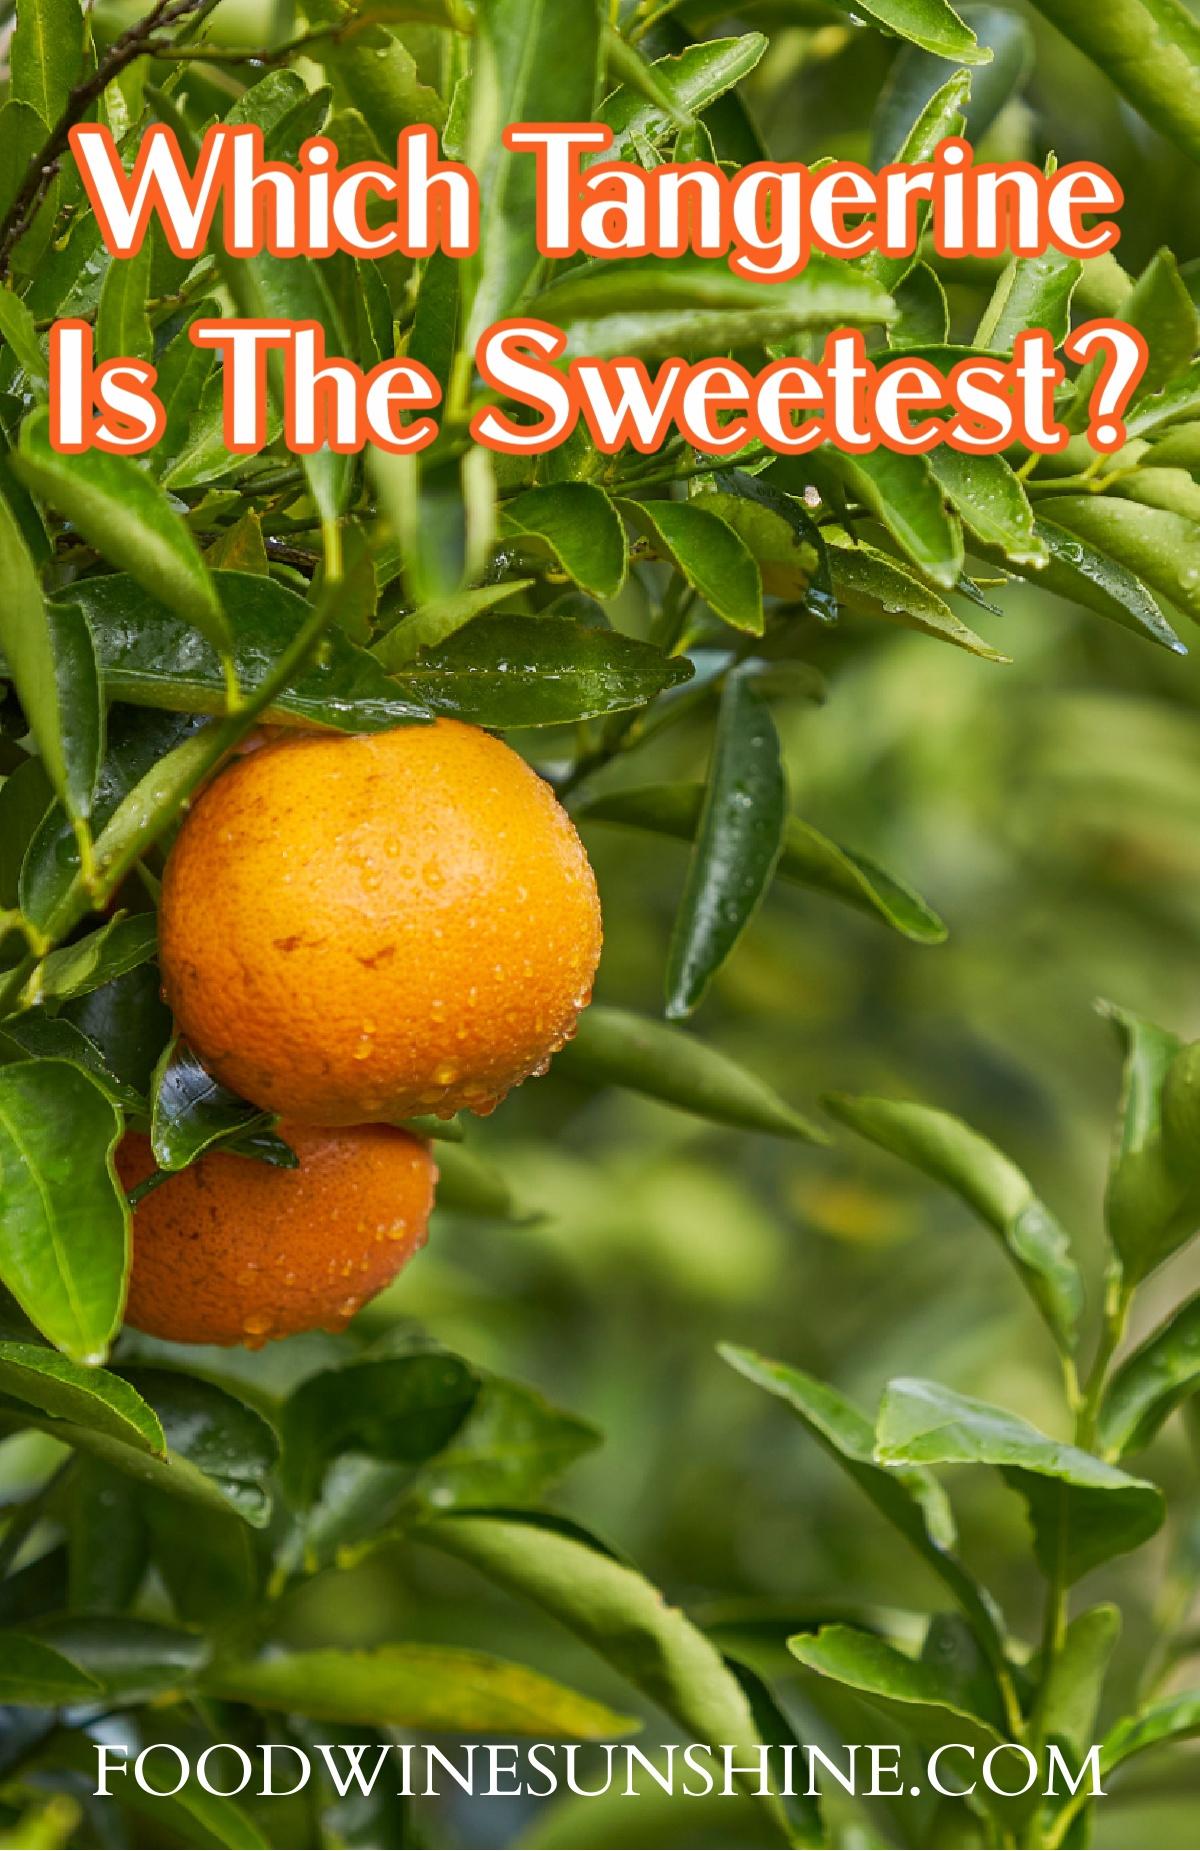 The sweetest tangerine